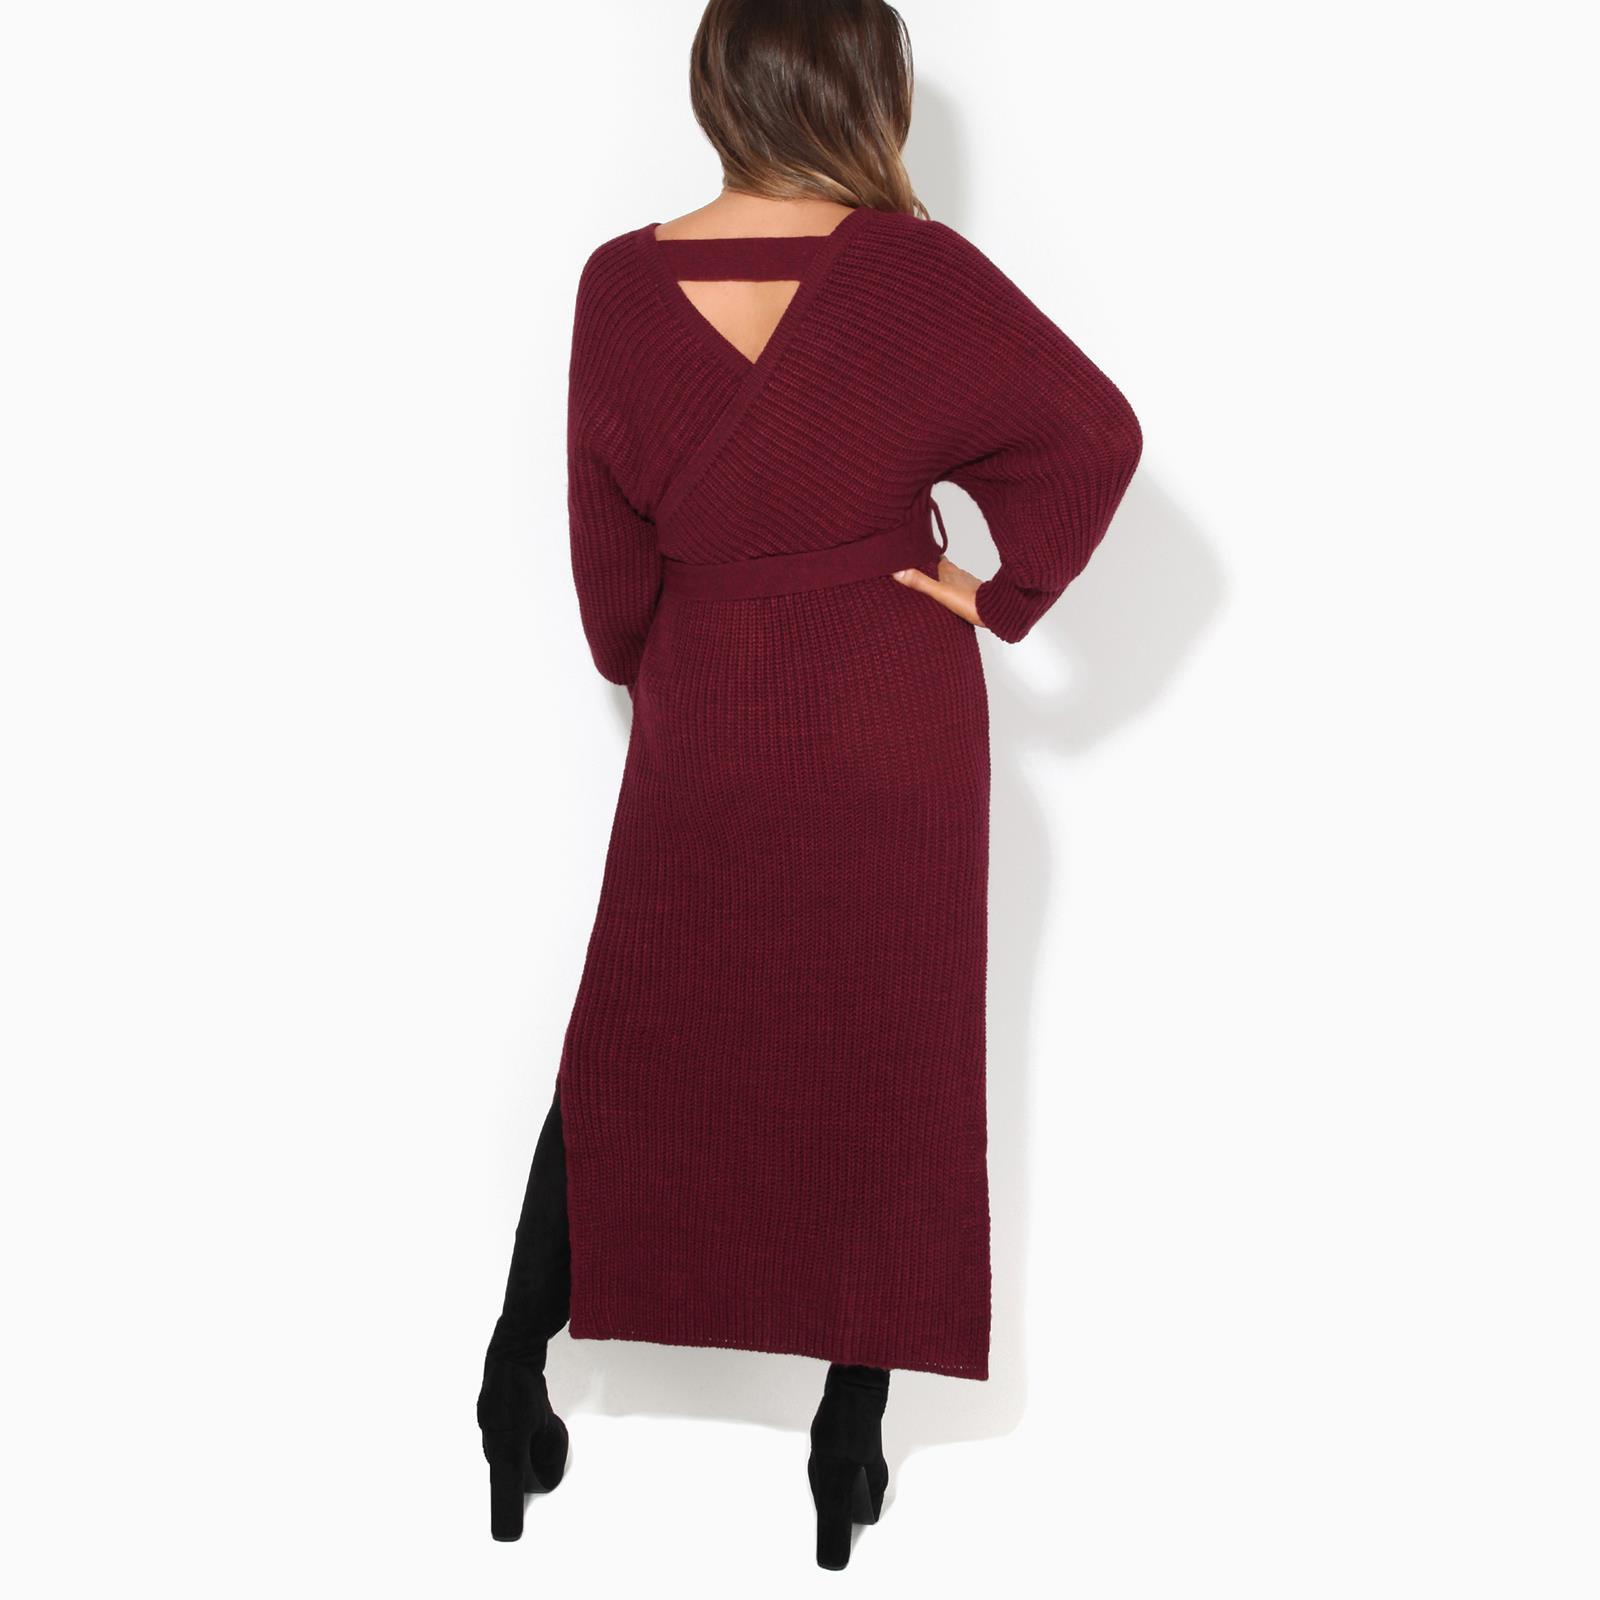 Womens-Ladies-Jumper-Dress-Chunky-Knit-Wrap-V-Neck-Maxi-Long-Sleeve-Winter-Top thumbnail 13